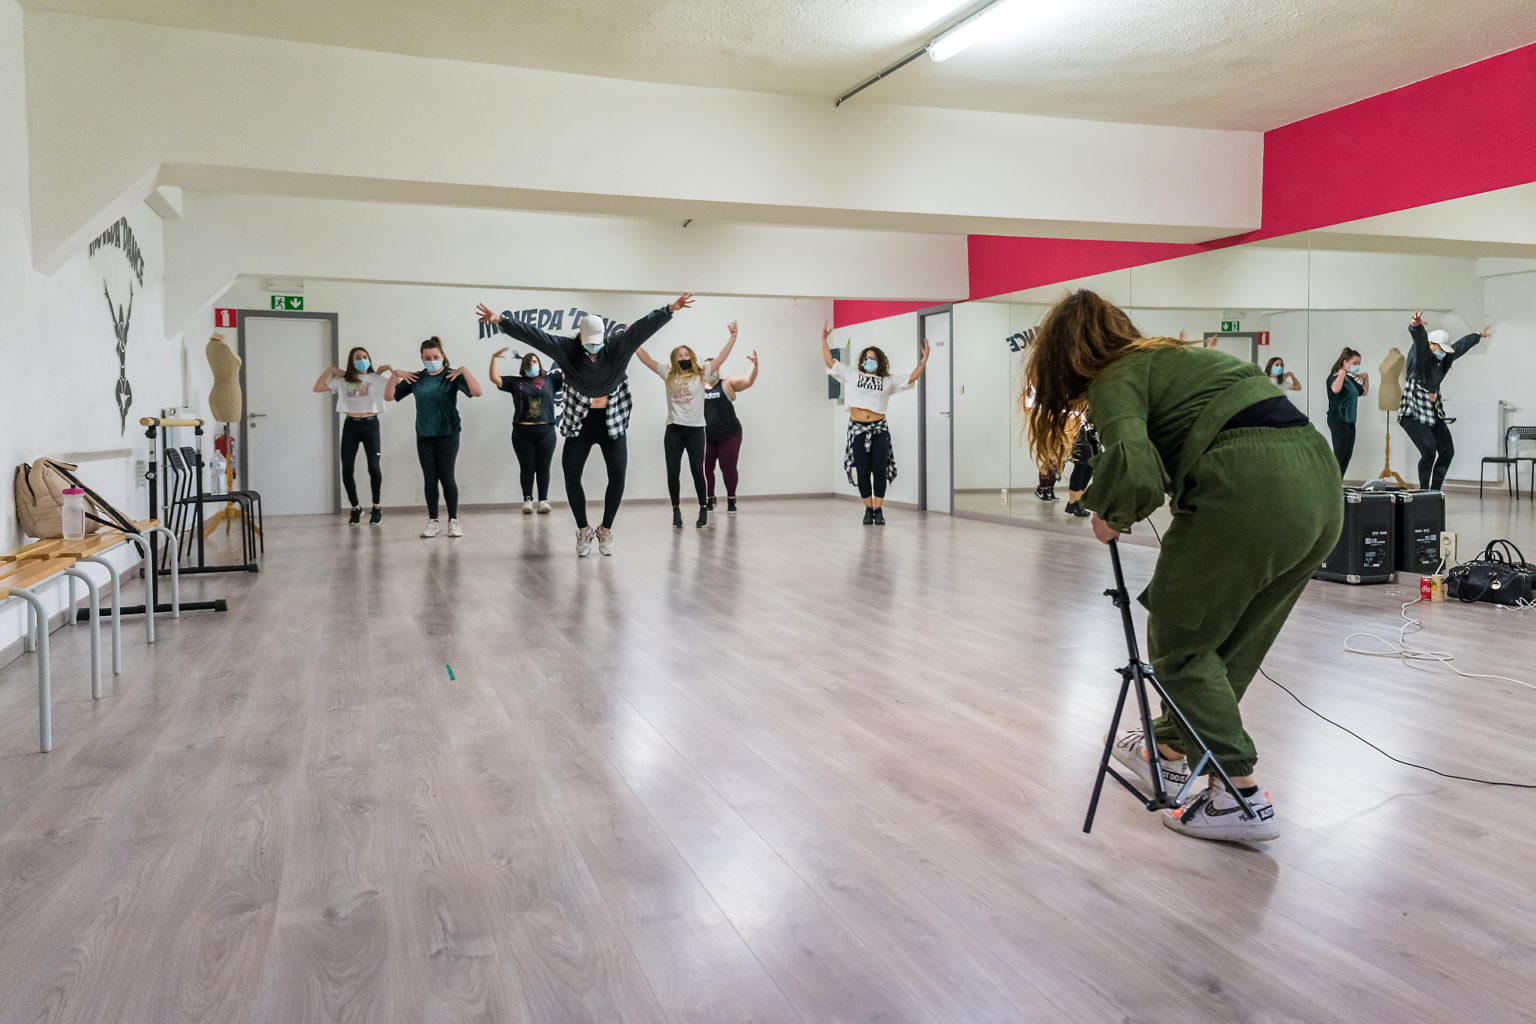 Enregistrement de vidéos pour Moveda'dance, Clara Sita